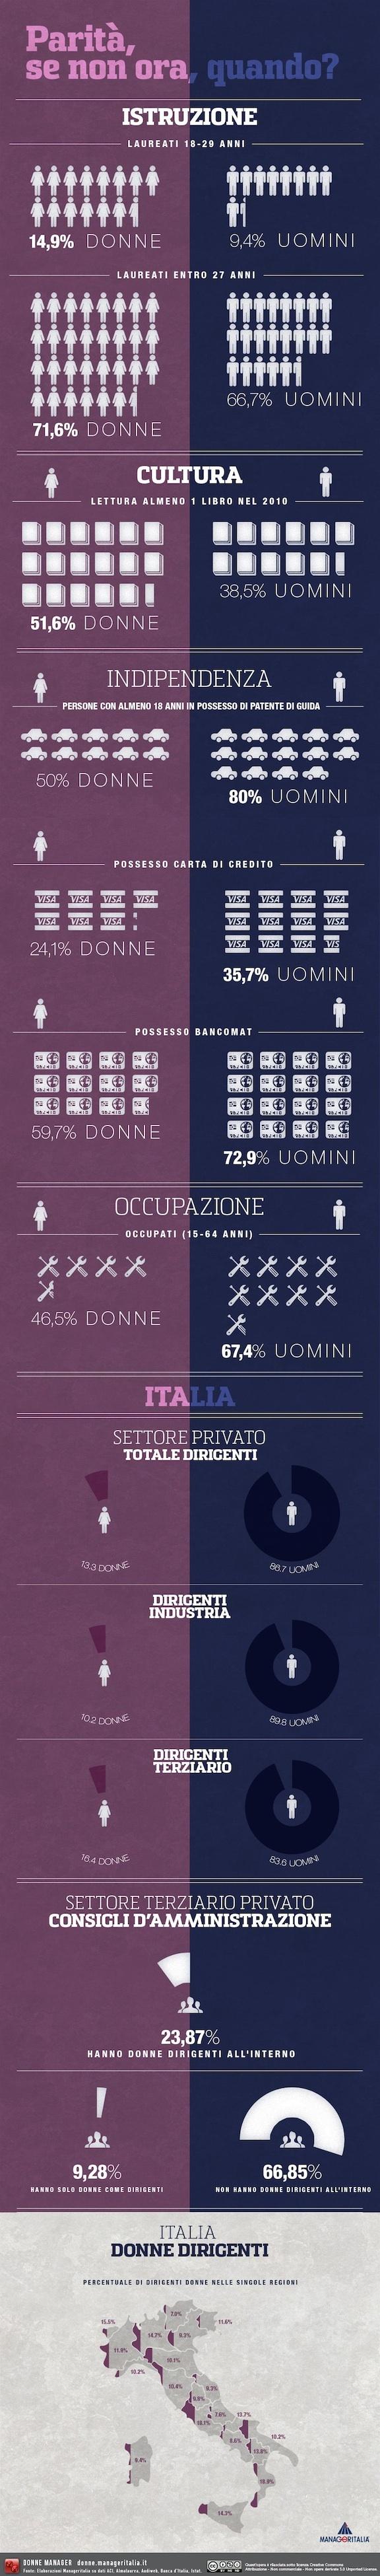 #donne manager #infografica